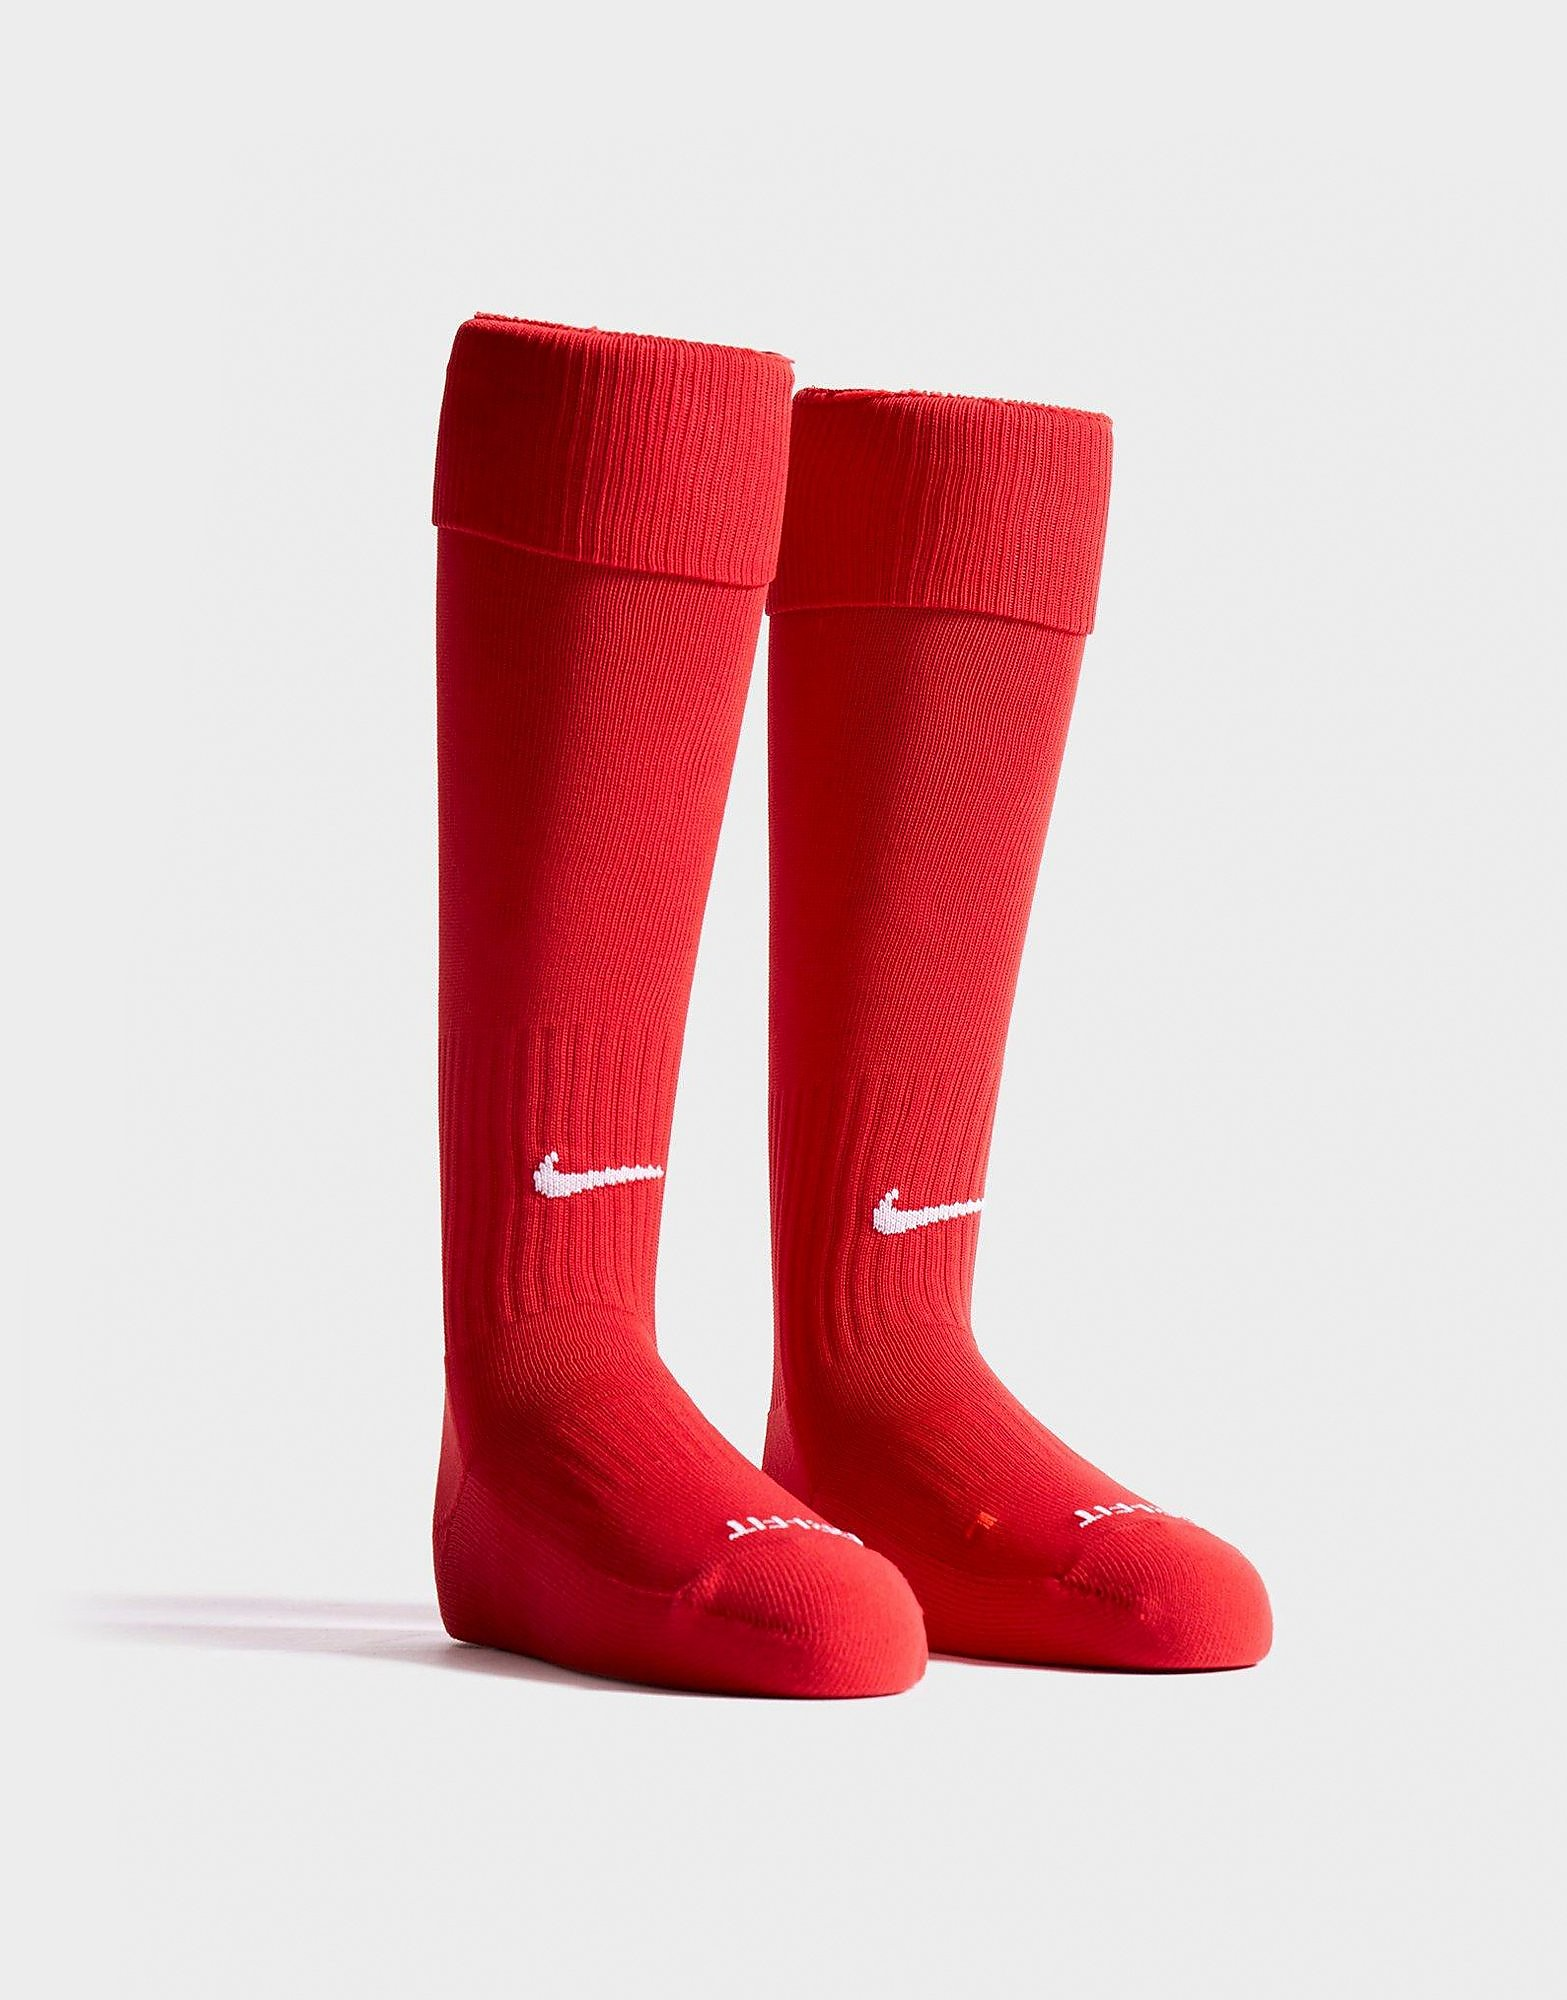 Nike Calzettoni da calcio classici